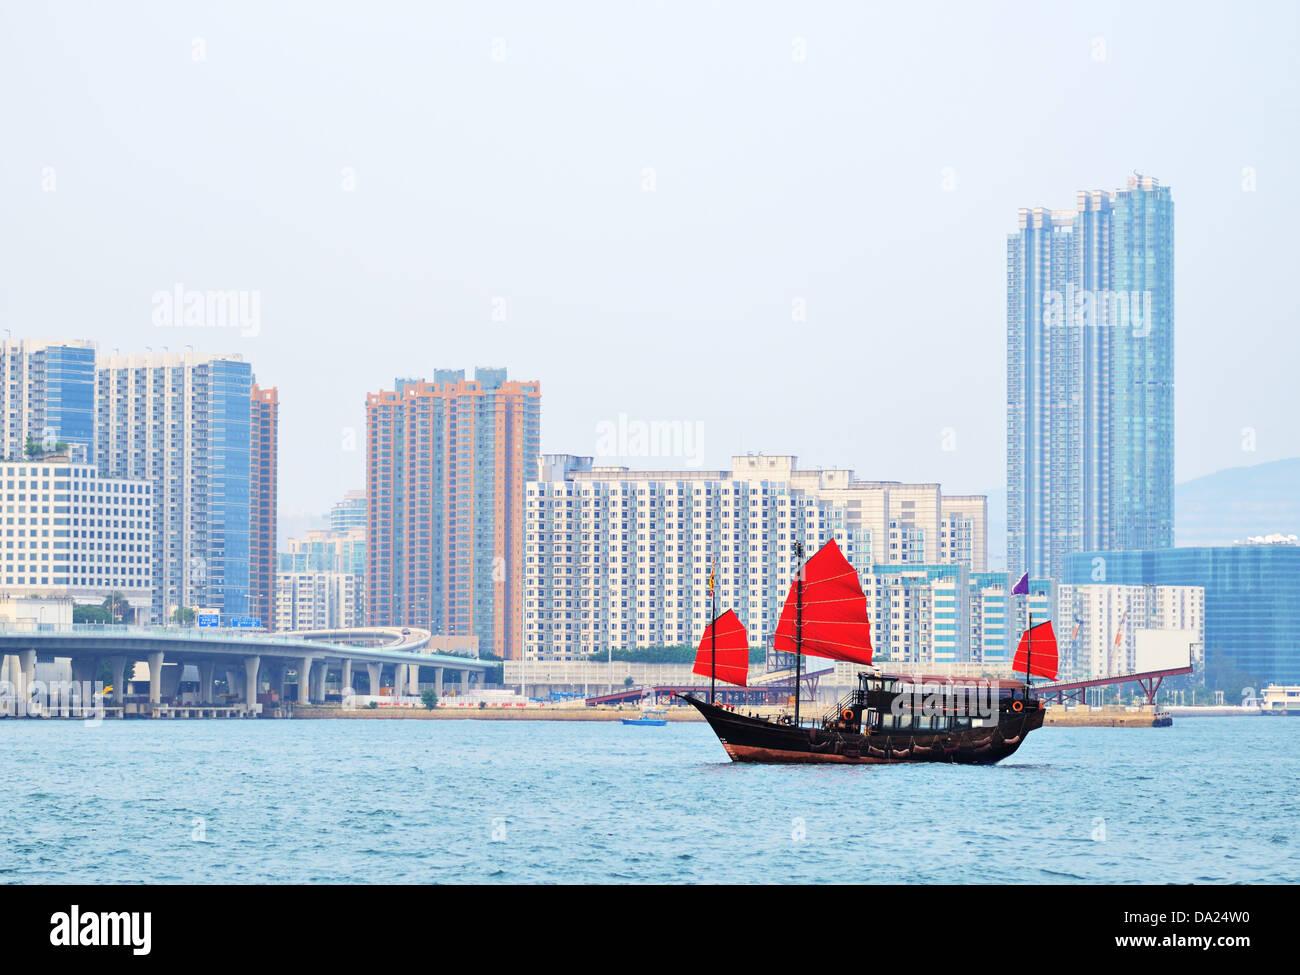 Chinesische Junk-shp in Victoria Harbour, Hong Kong, China. Stockbild